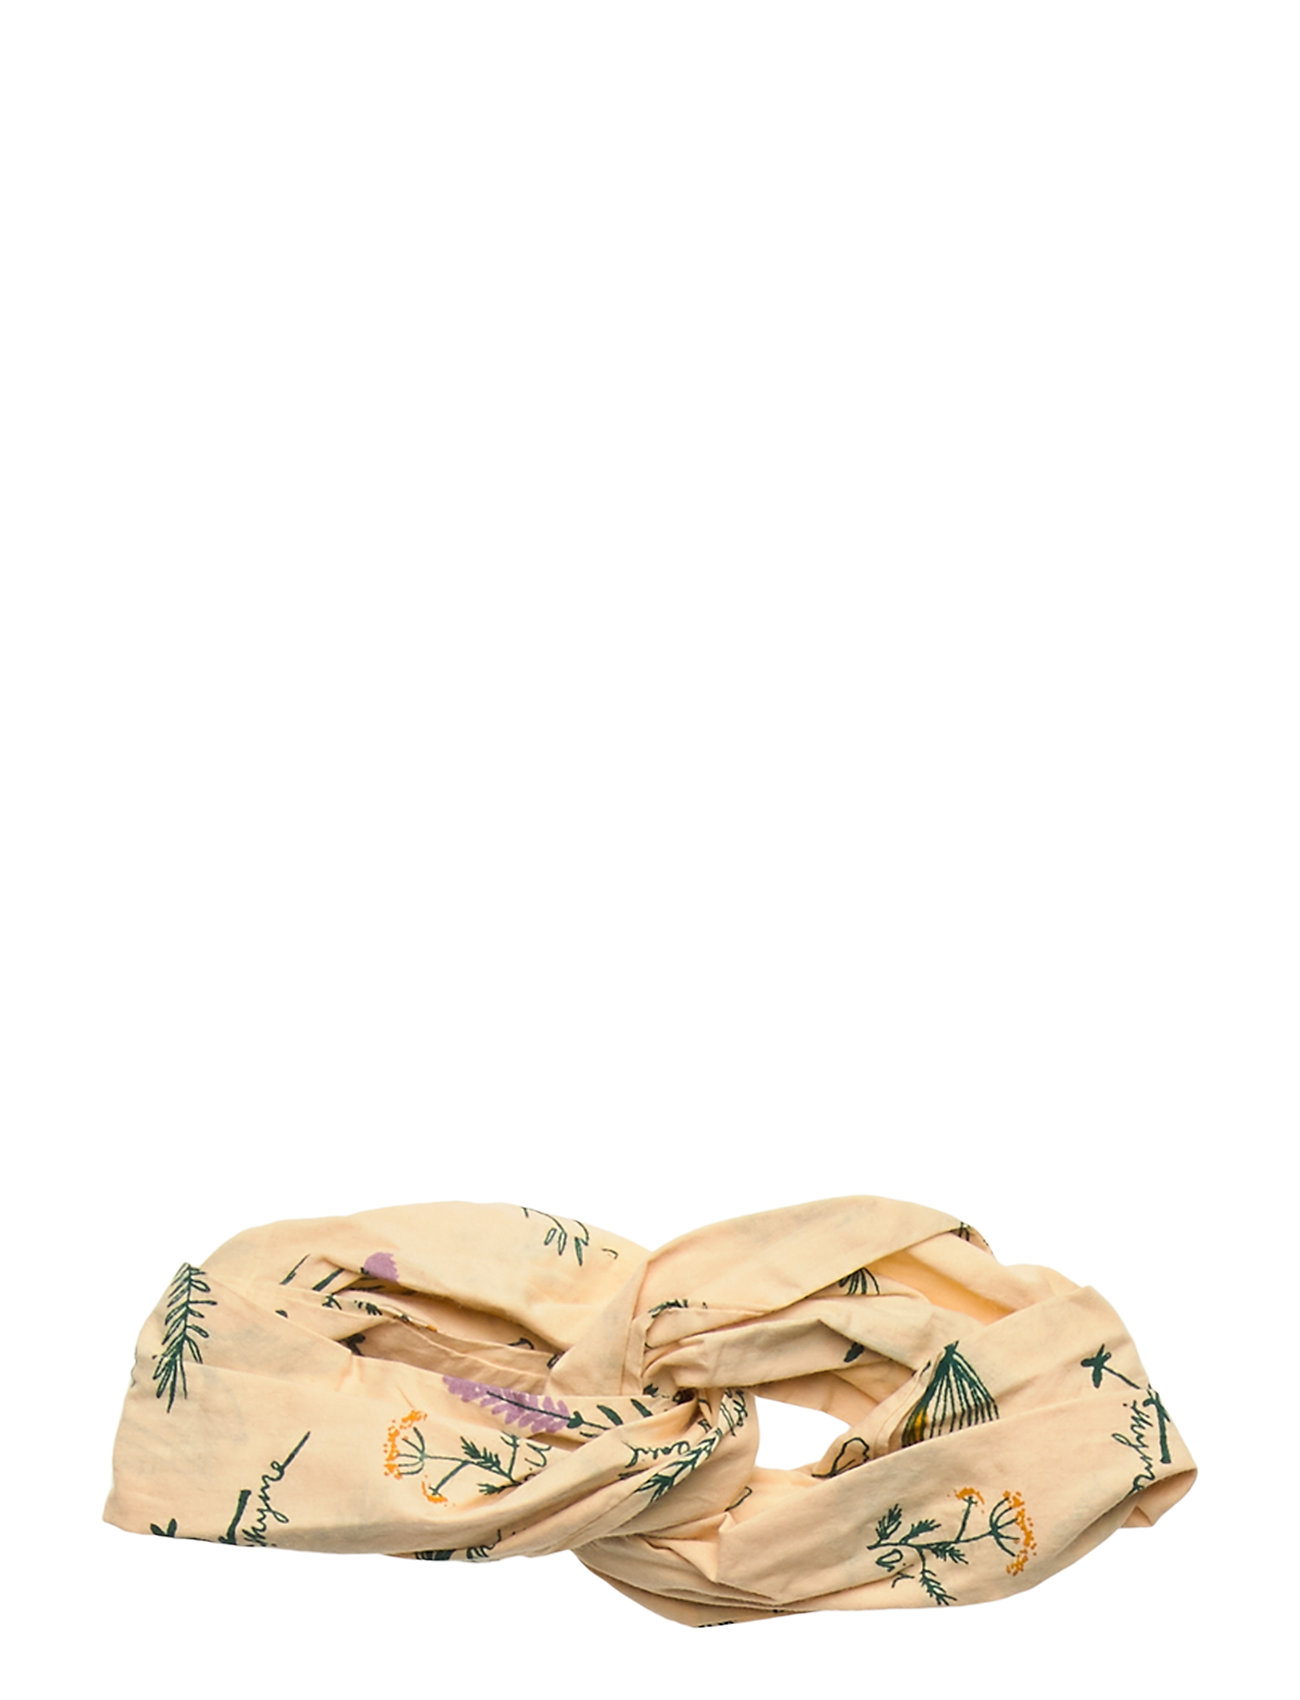 Soft Gallery Wrap Hairband - WINTER WHEAT, AOP HEALING HERBS